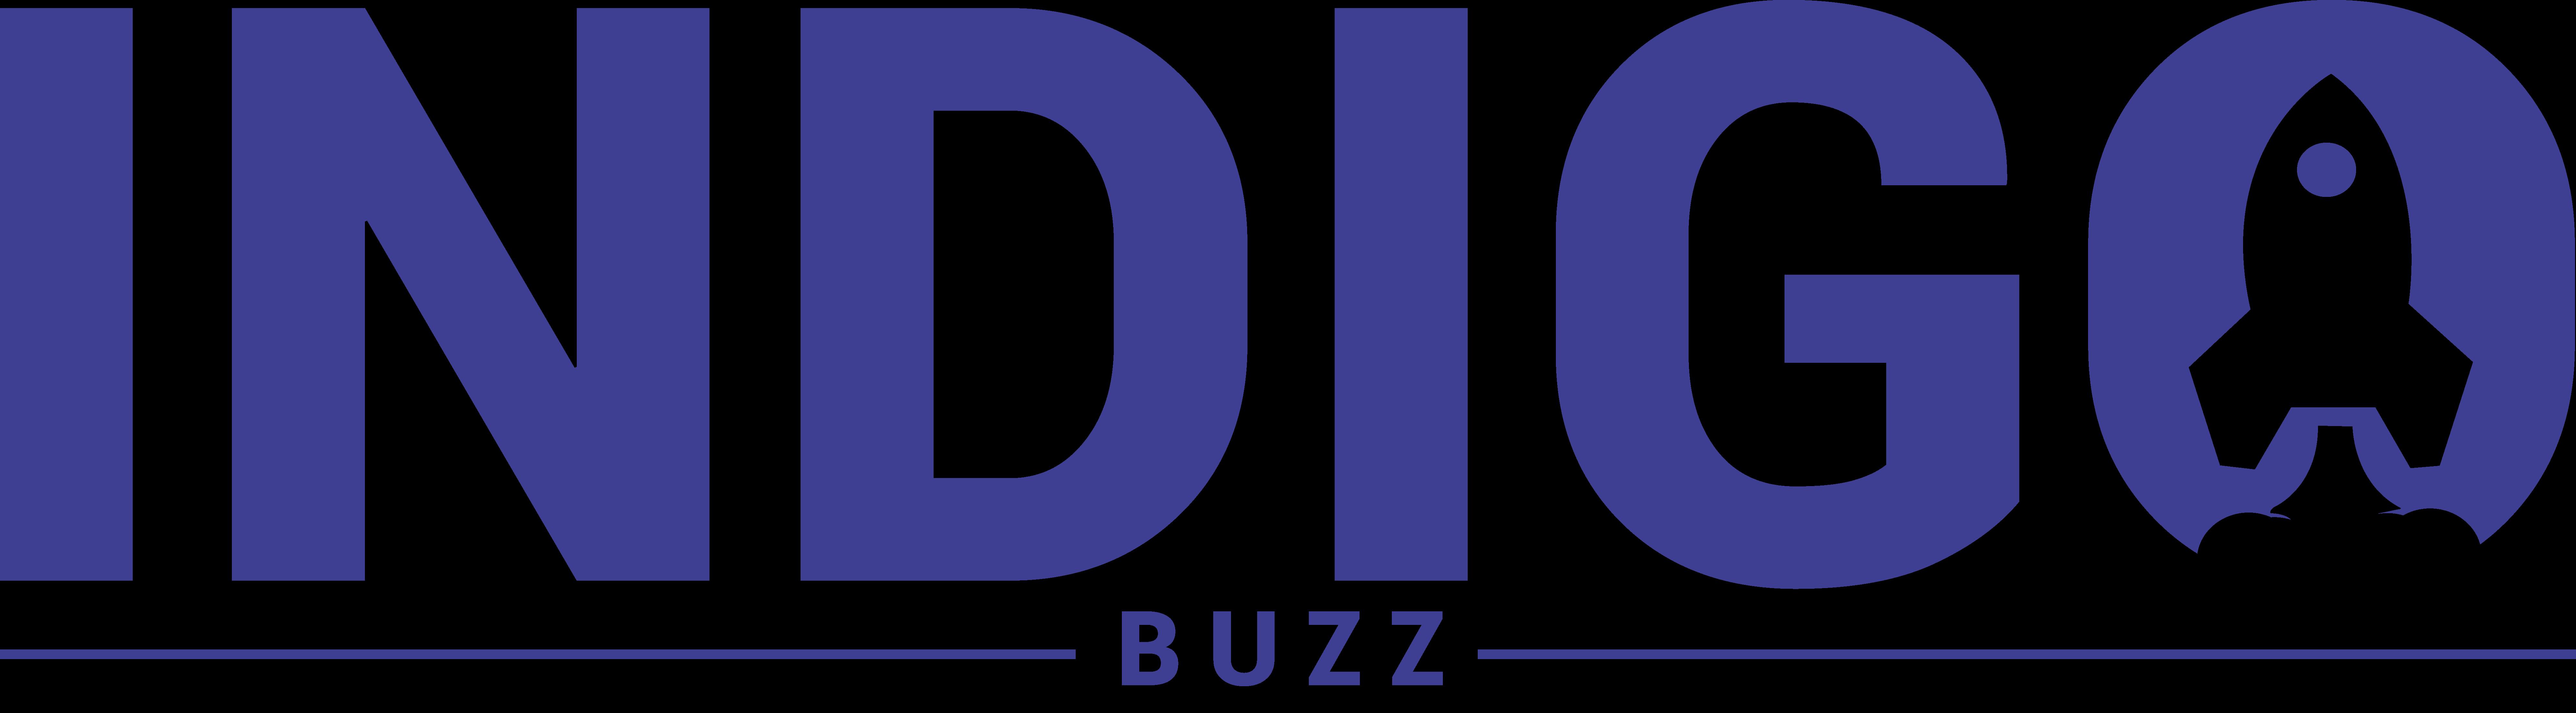 Indigo Buzz - L'actualité high-tech, jeu vidéo, mobile,... qui buzz !